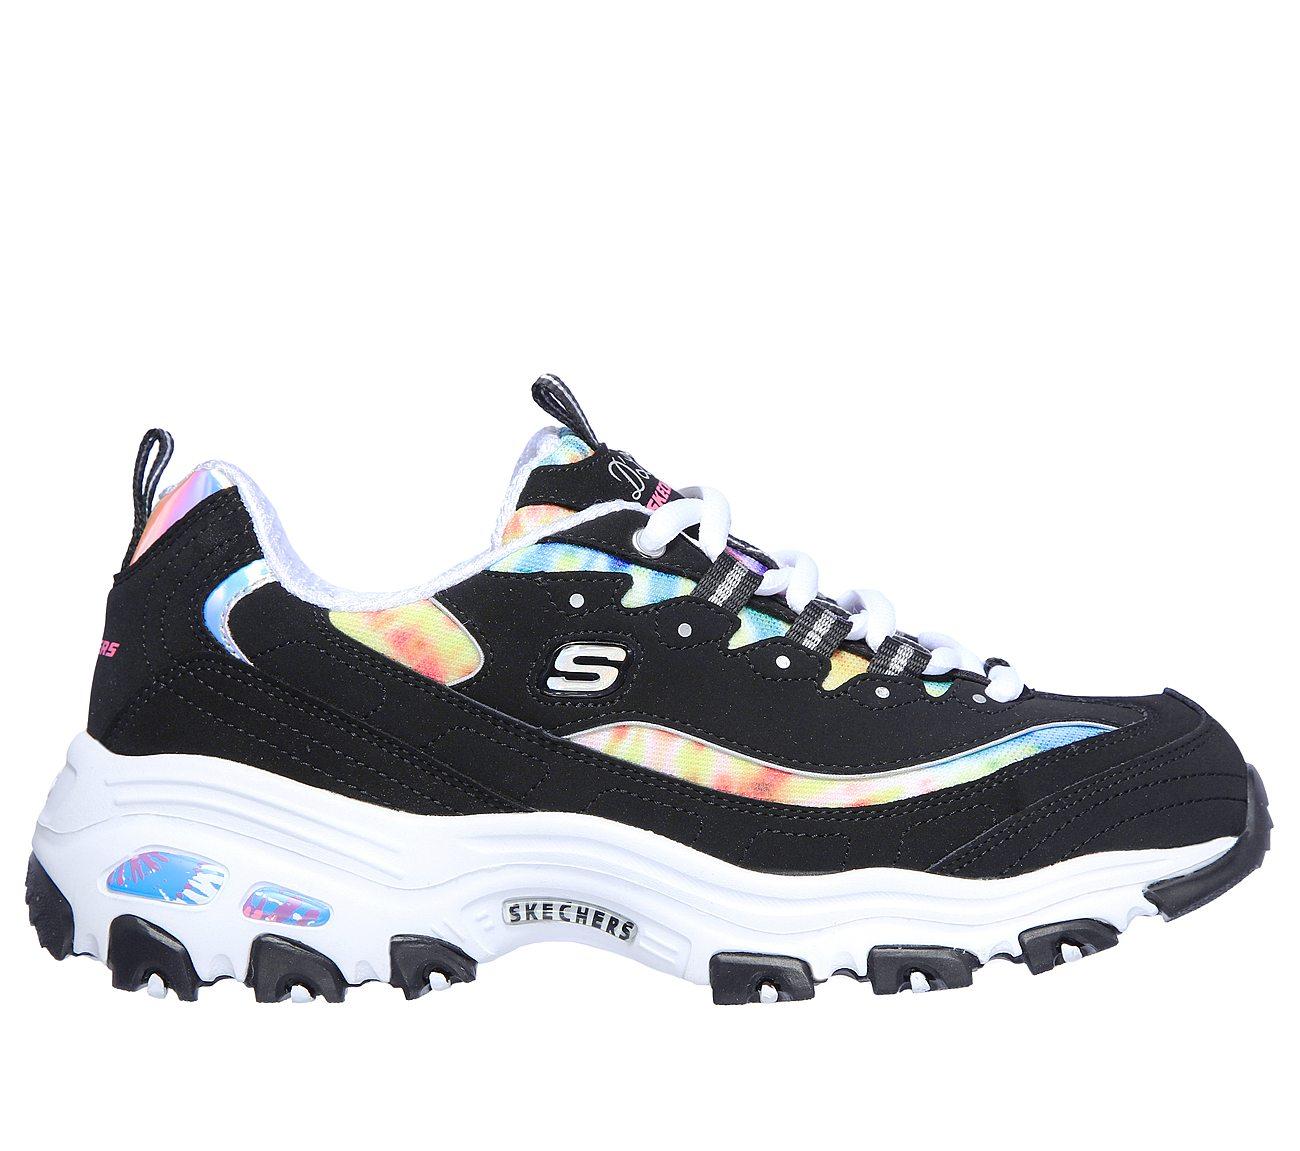 Sorprendido Hacer Bonito  Buy SKECHERS D'Lites - Summer Fiesta Training Shoes Shoes